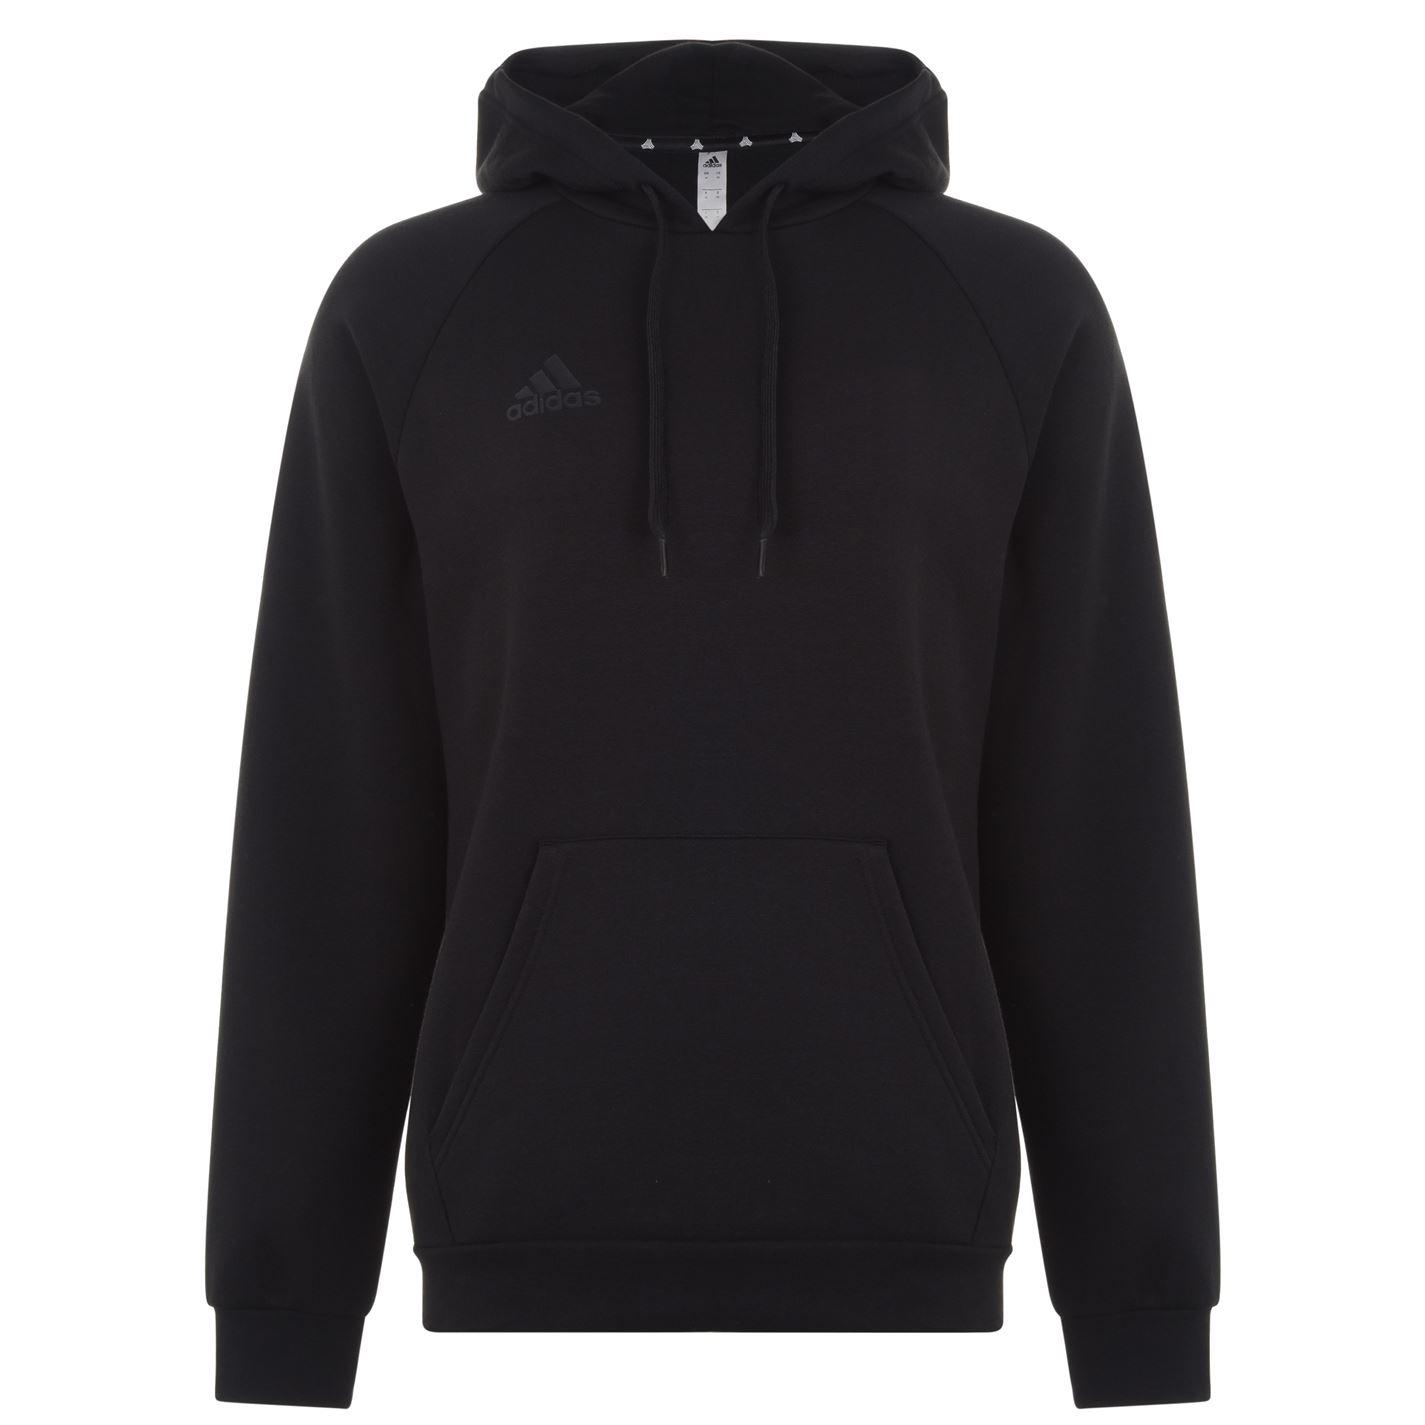 Adidas Tango Hoodie Mens